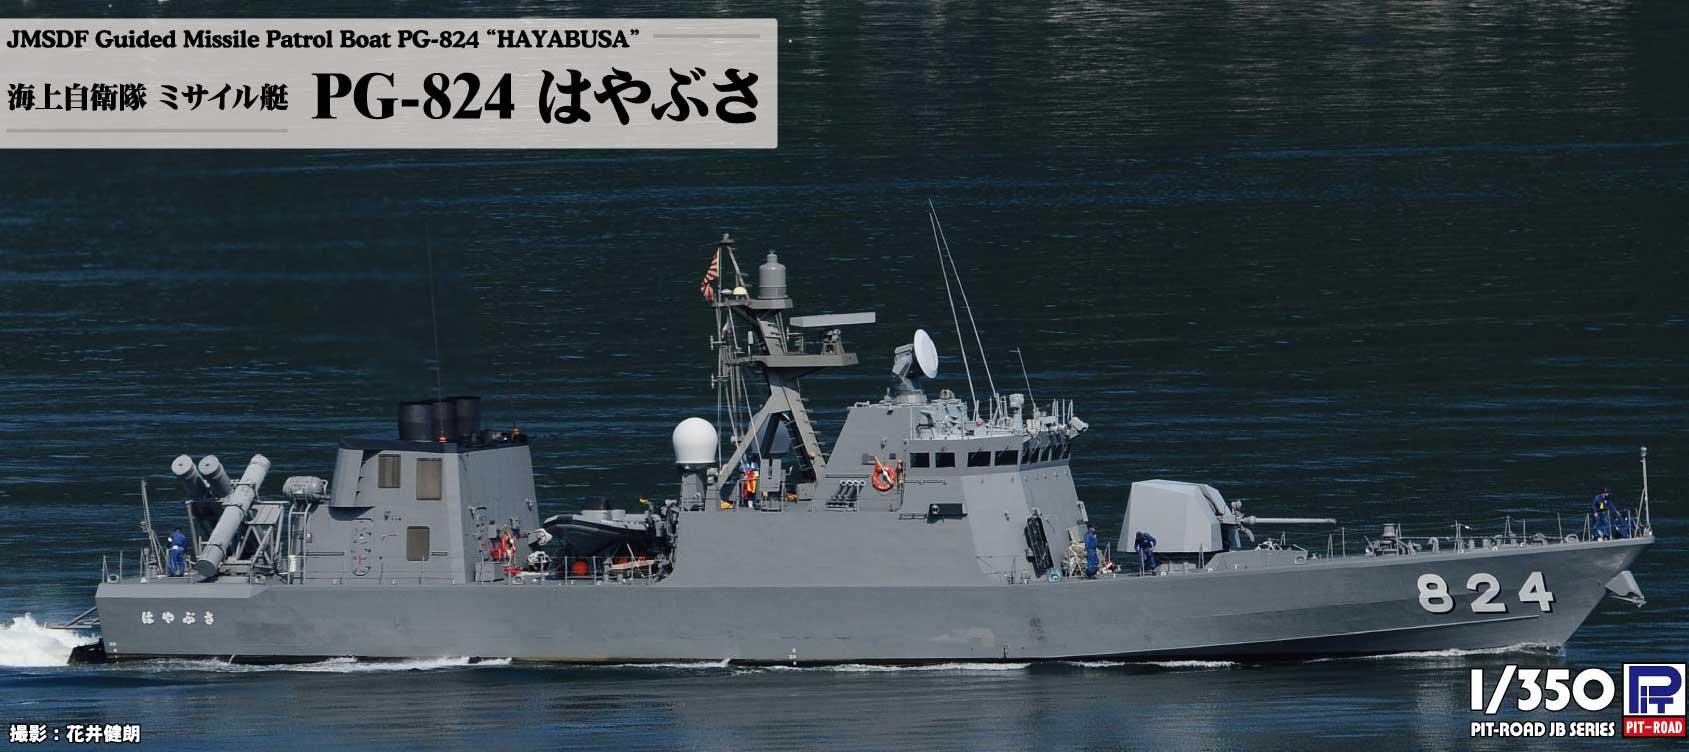 JB30 1/350 海上自衛隊 ミサイル艇 PG-824 はやぶさ